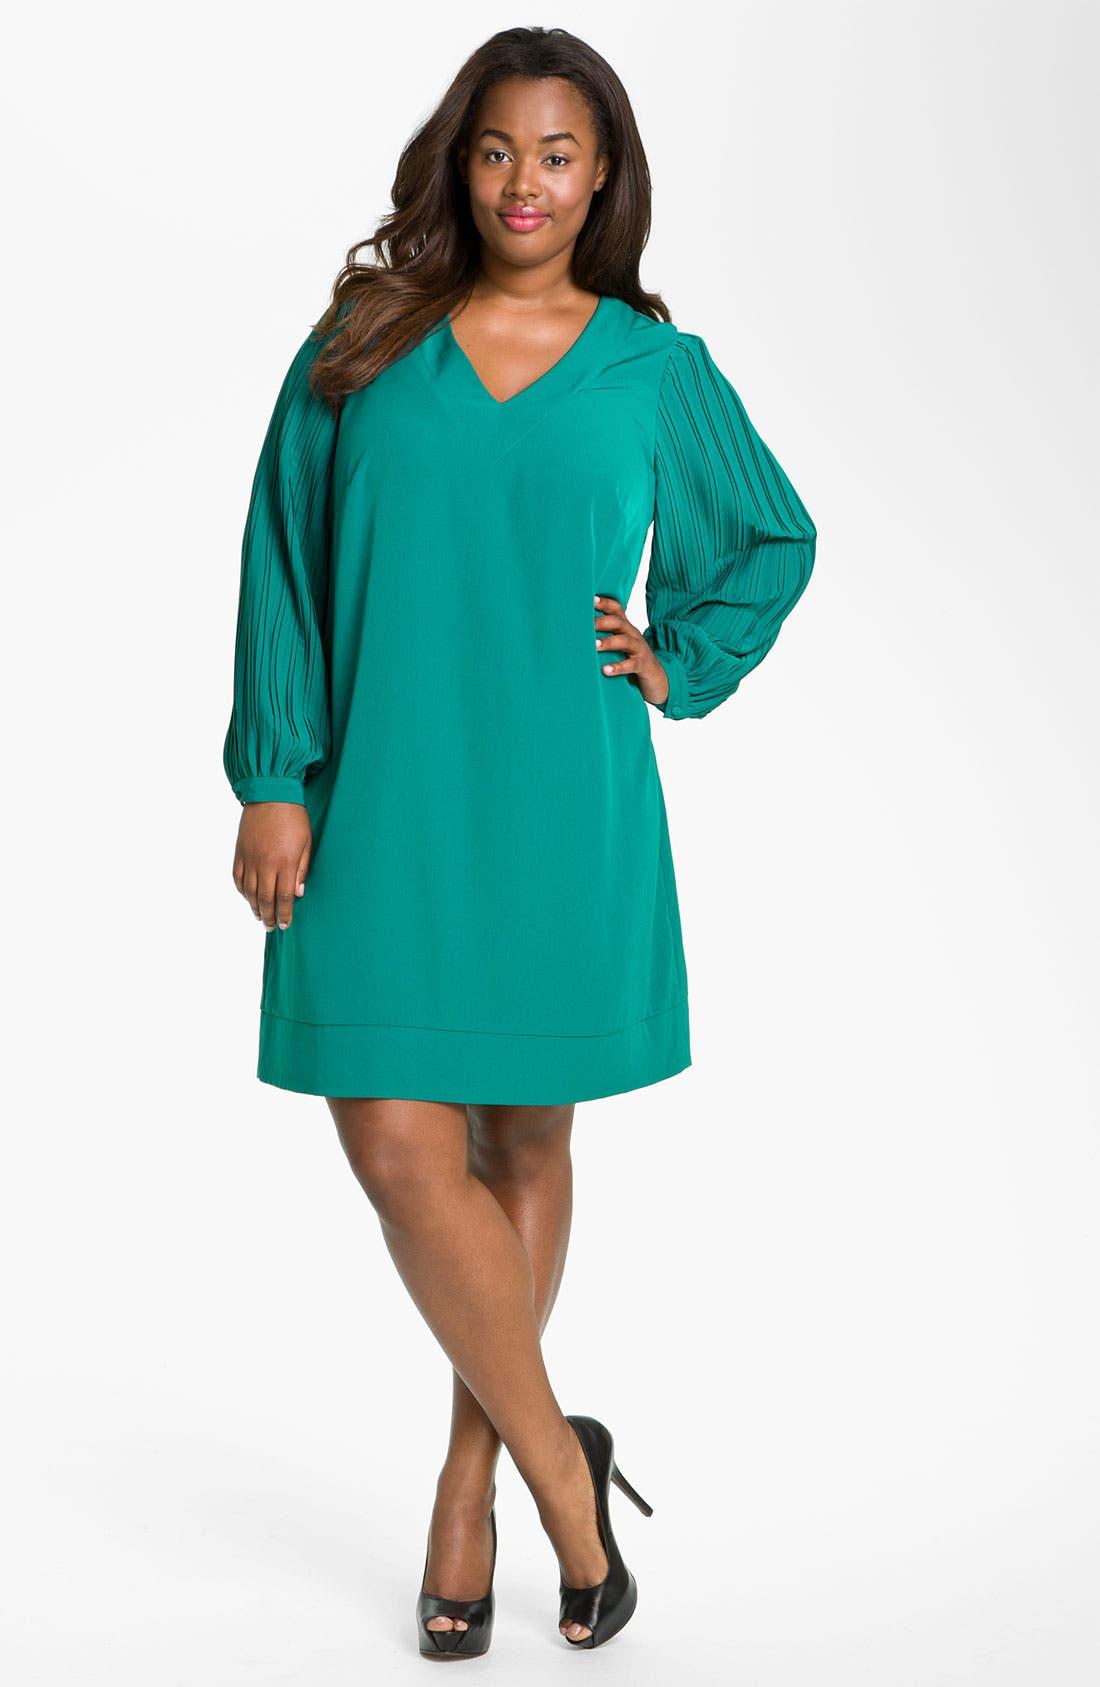 Alternate Image 1 Selected - Donna Ricco Pleat Sleeve Shift Dress (Plus)